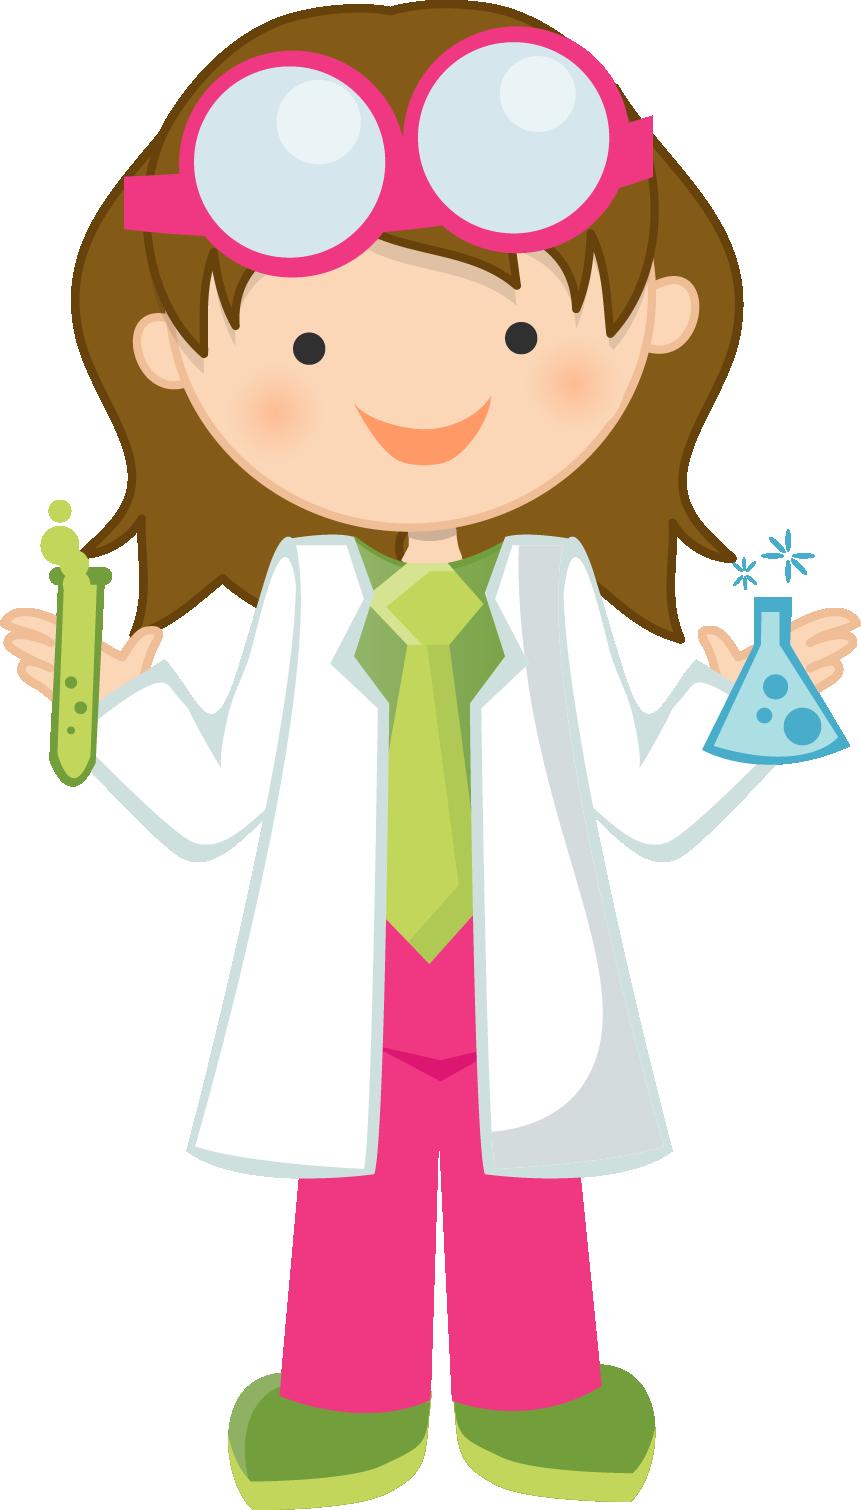 861x1510 Girl Scientist Free Clipart Science Fun Free, Clip